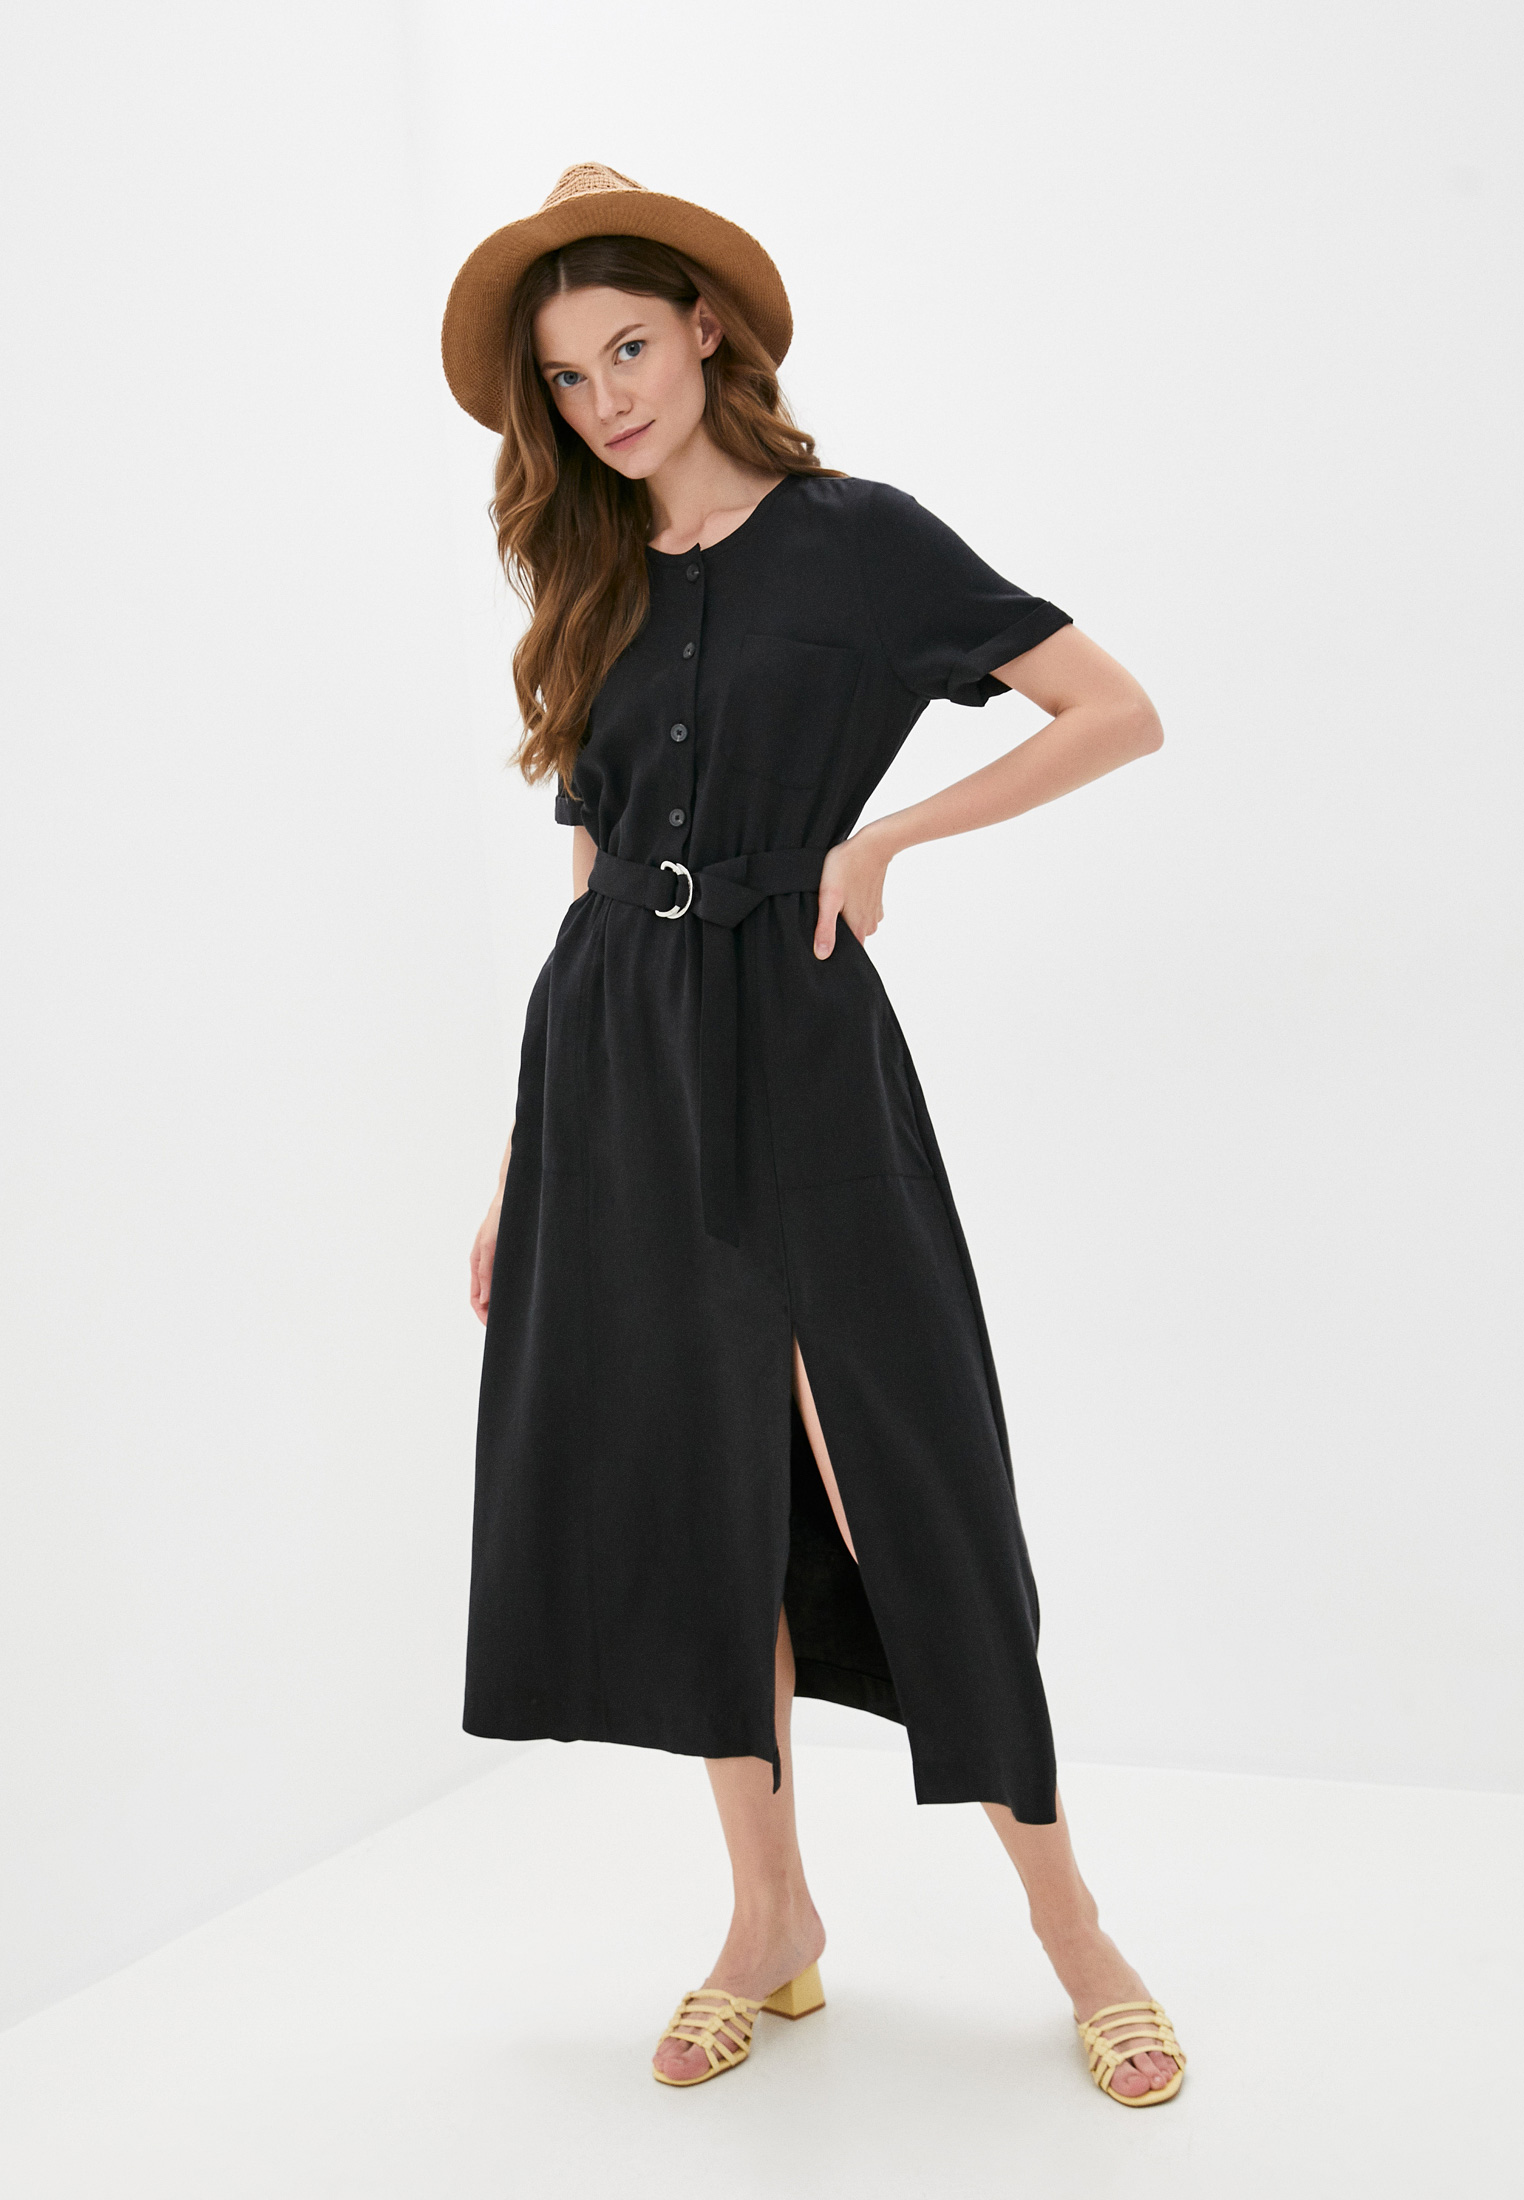 Платье Tommy Hilfiger (Томми Хилфигер) WW0WW28379